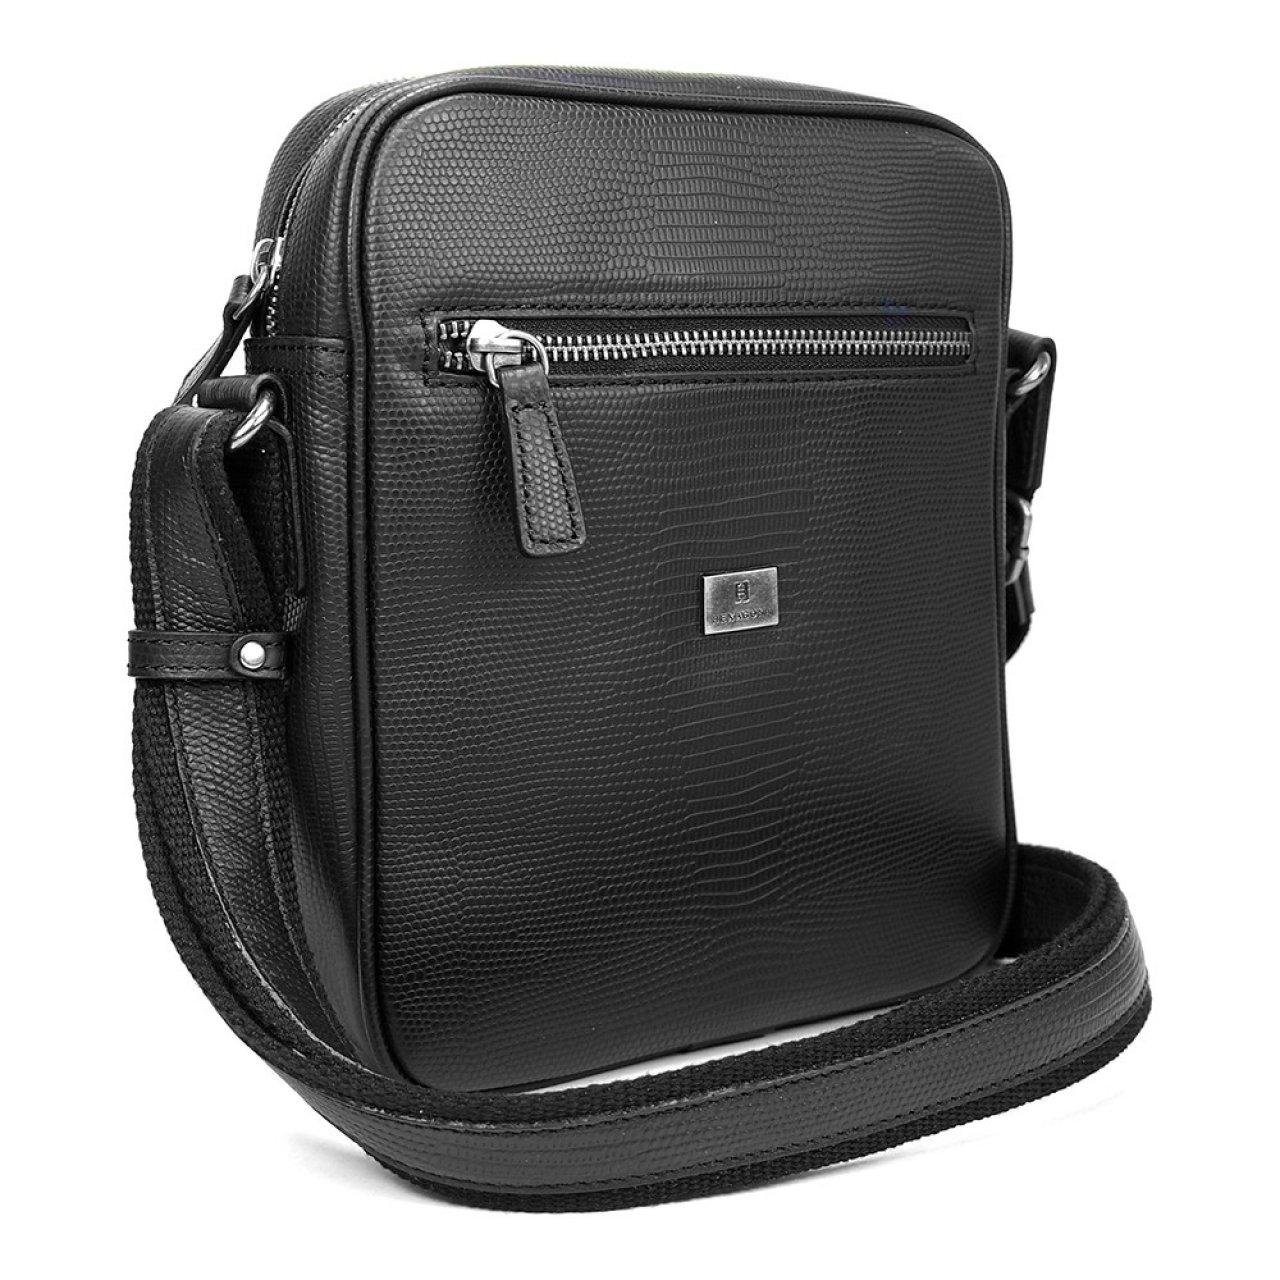 1fed73a512 Pánská kožená taška přes rameno Hexagona 854017 - černá